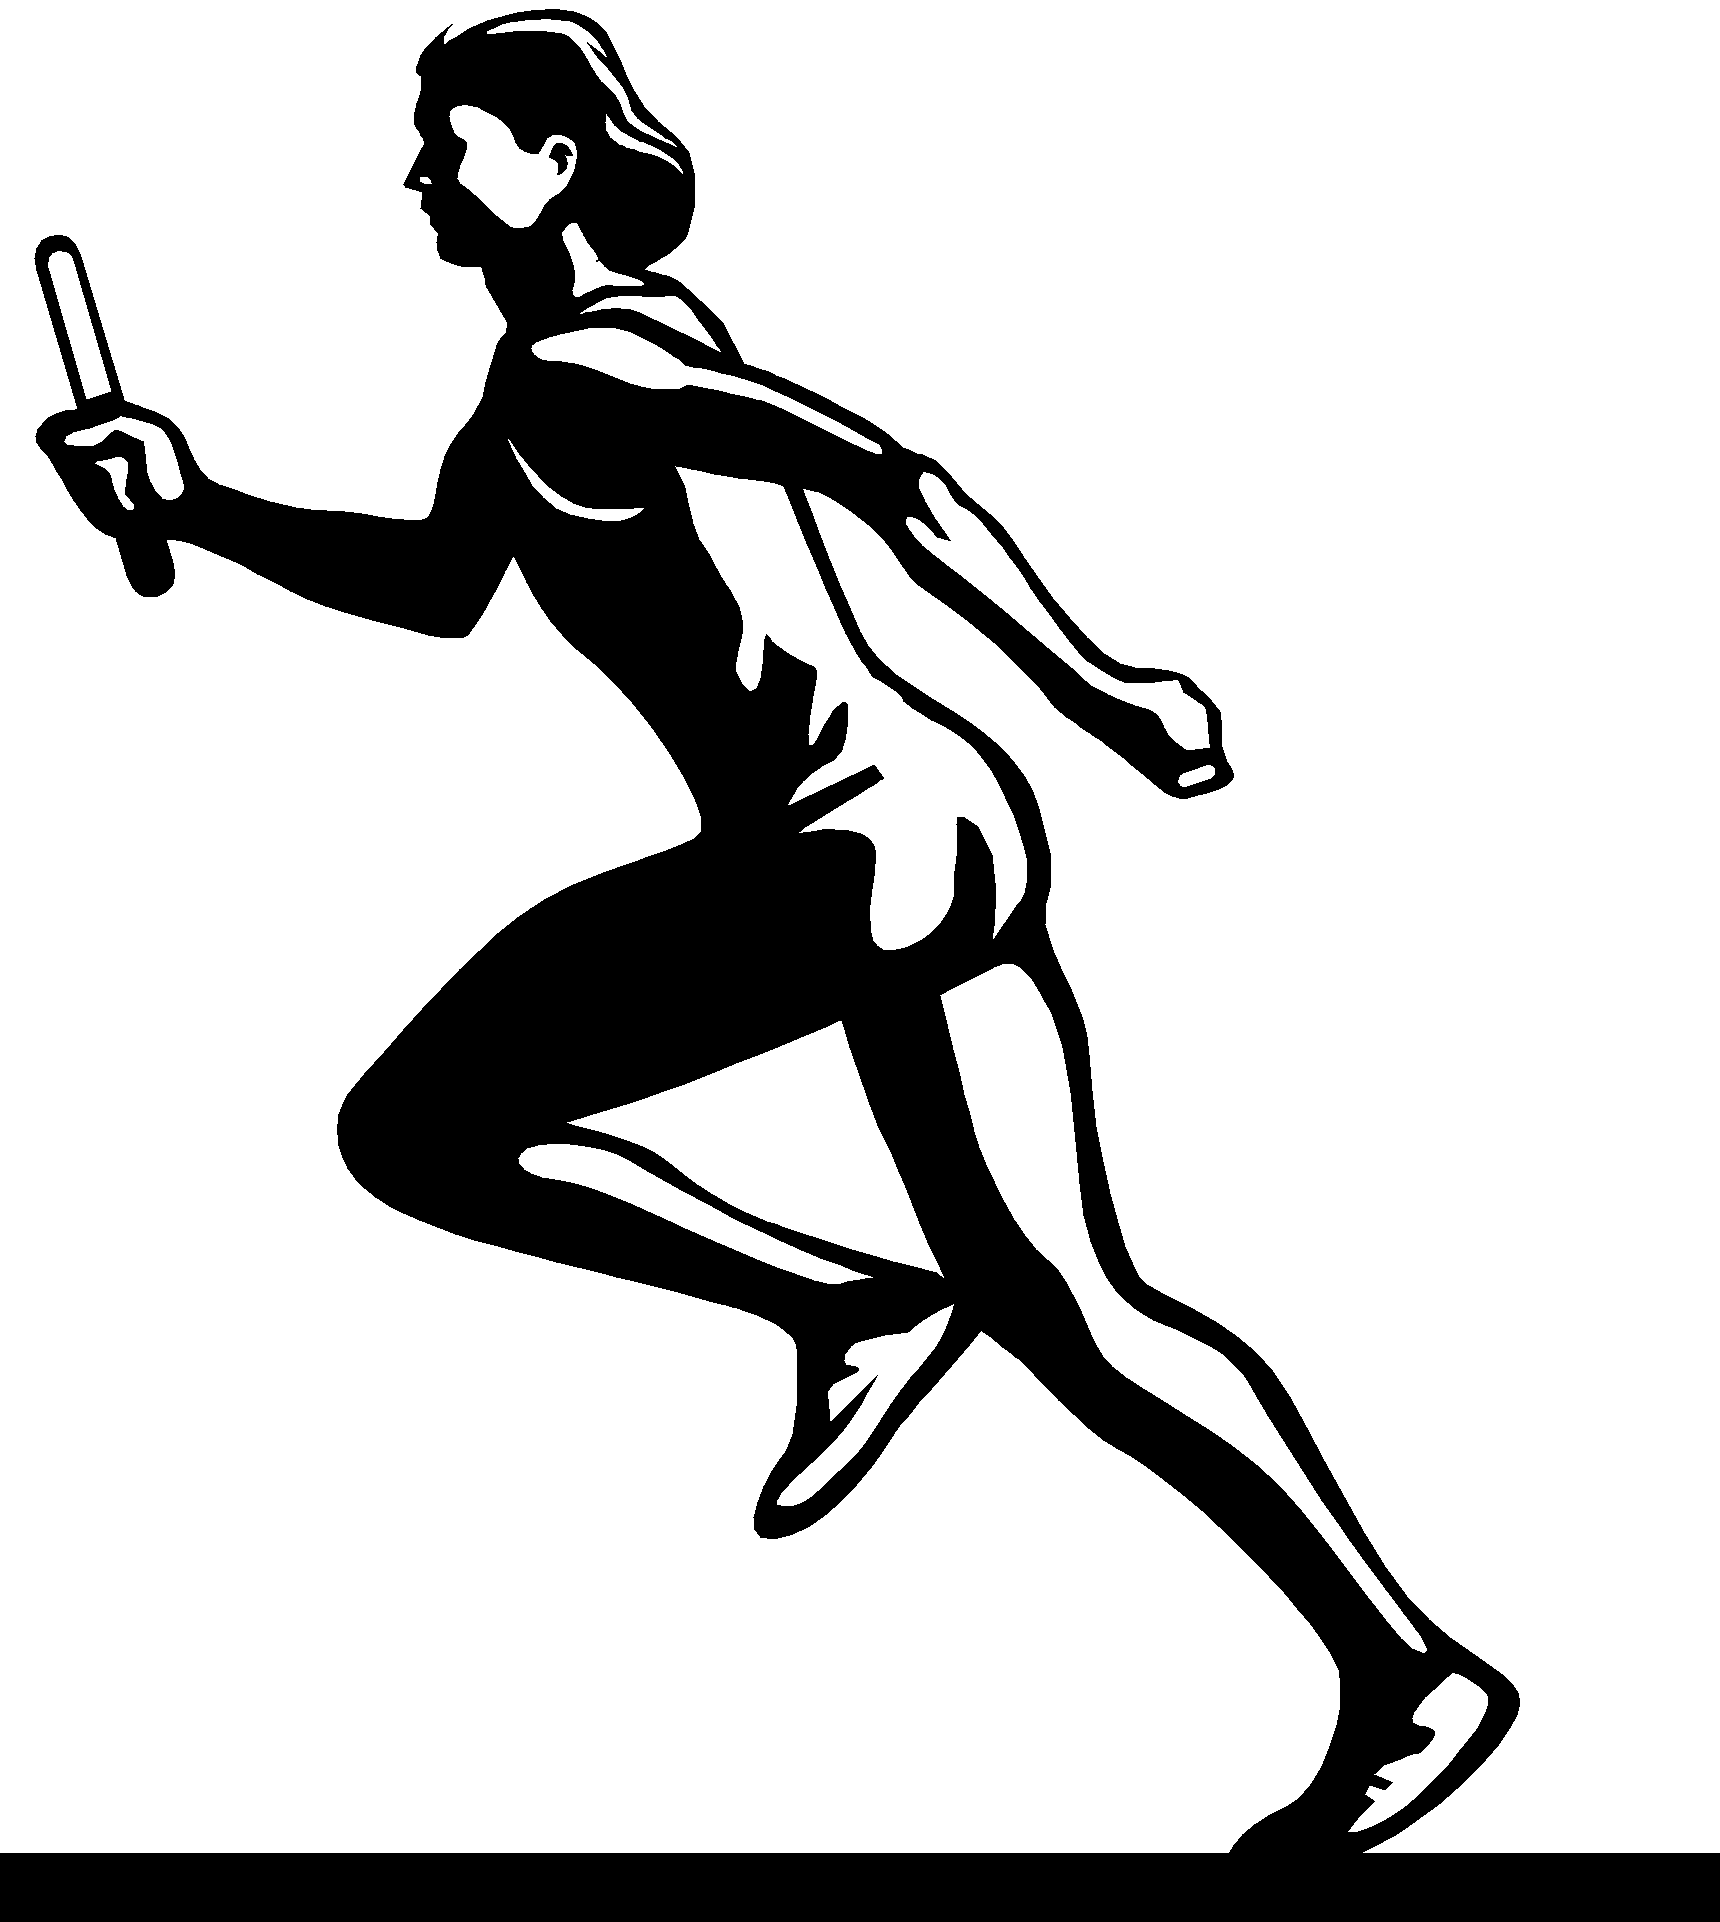 Running Track Drawing At Getdrawings